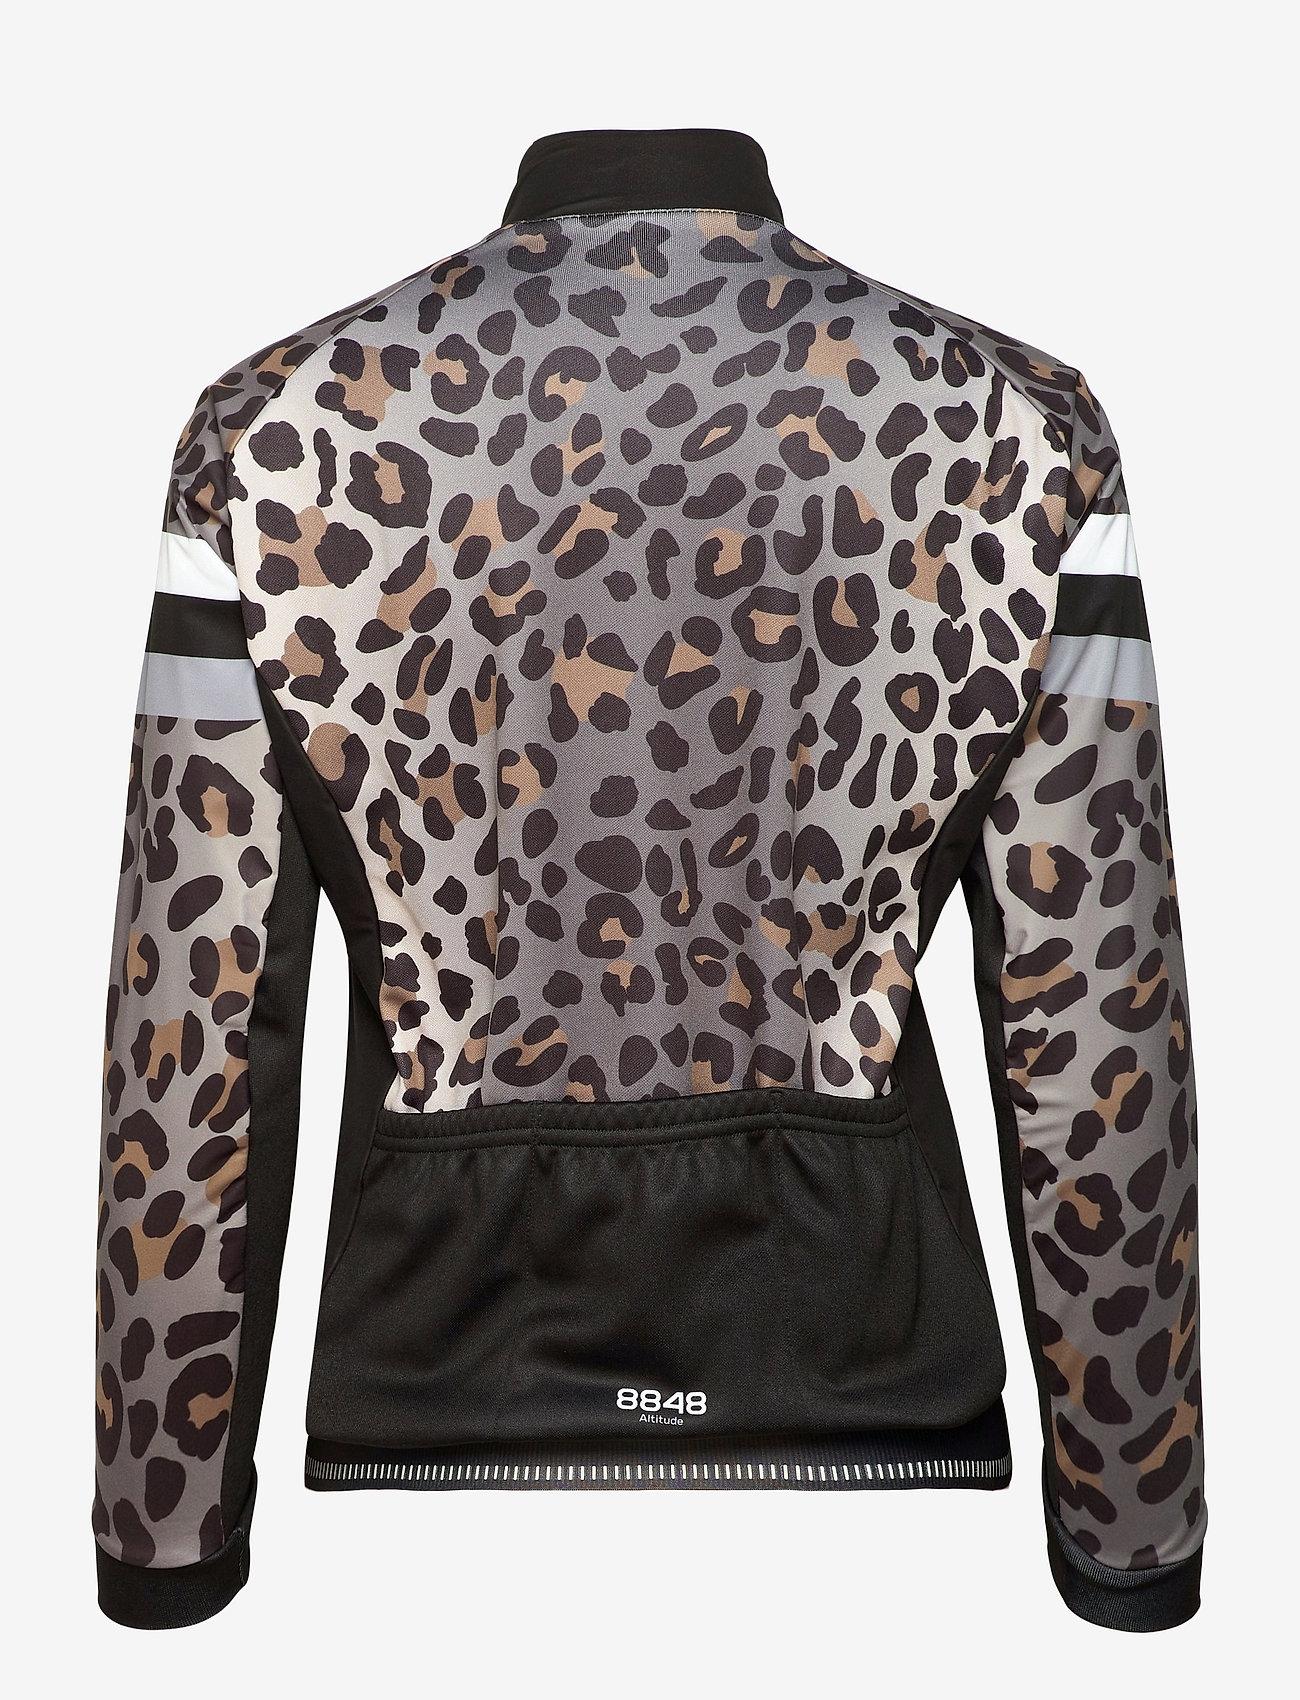 8848 Altitude - Cherie W Jacket - sports jackets - leopard - 1